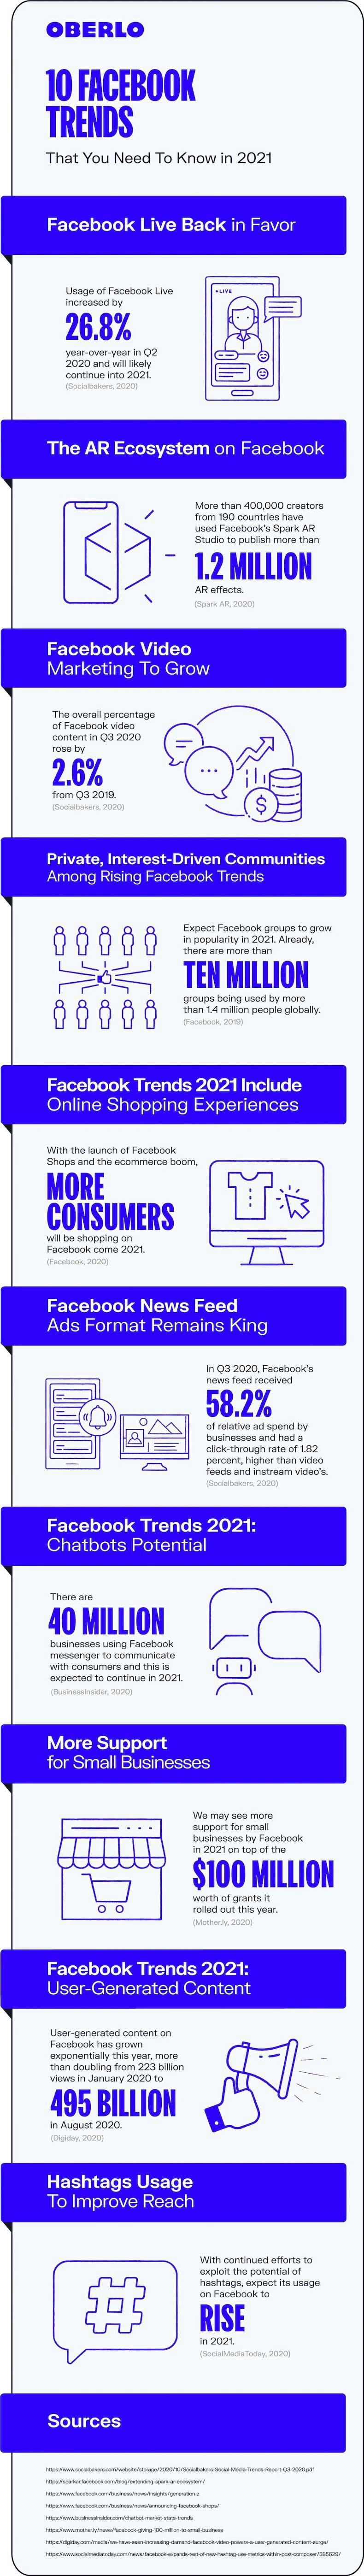 10 Facebook Trends to Watch in 2021